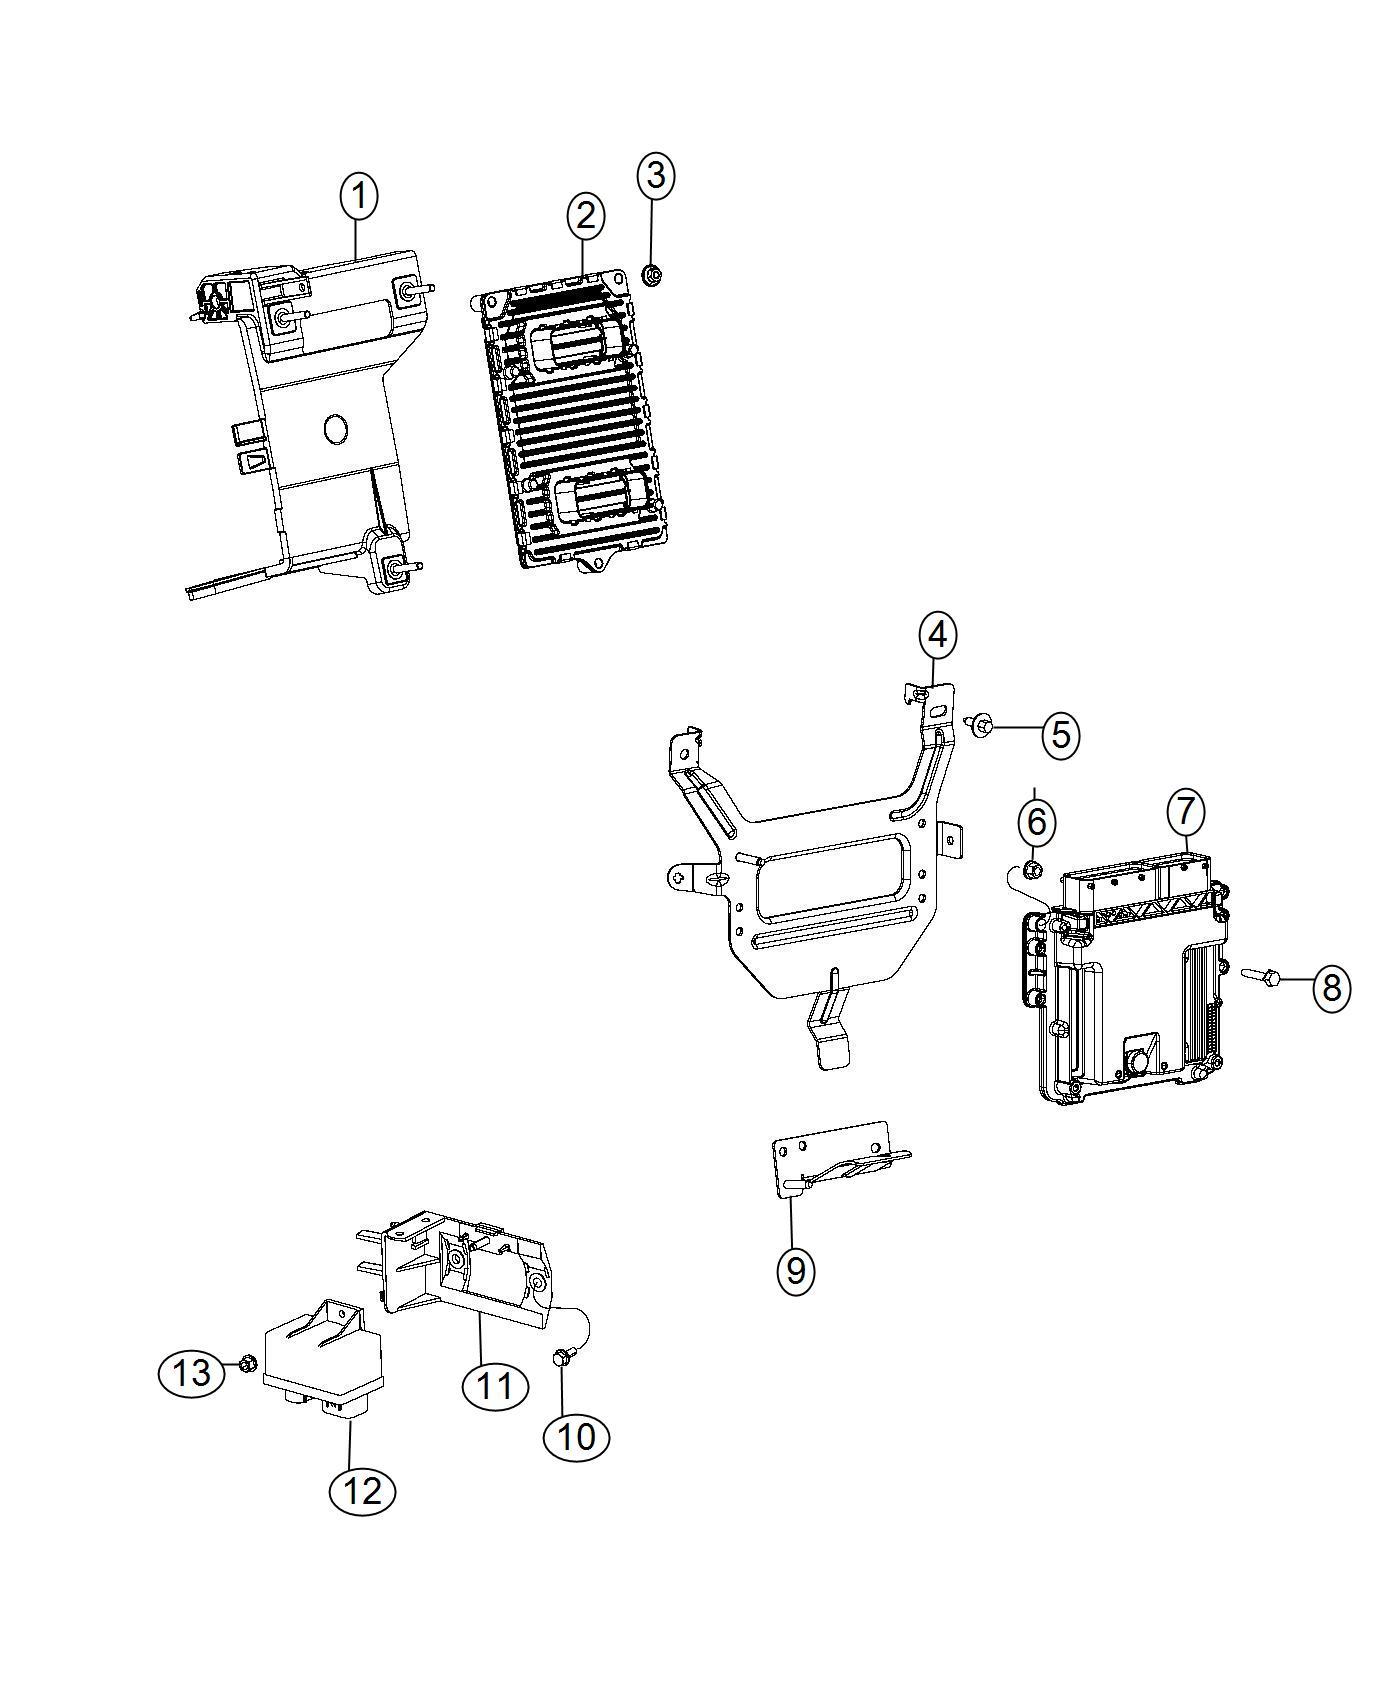 05150790ac jeep module powertrain control generic. Black Bedroom Furniture Sets. Home Design Ideas